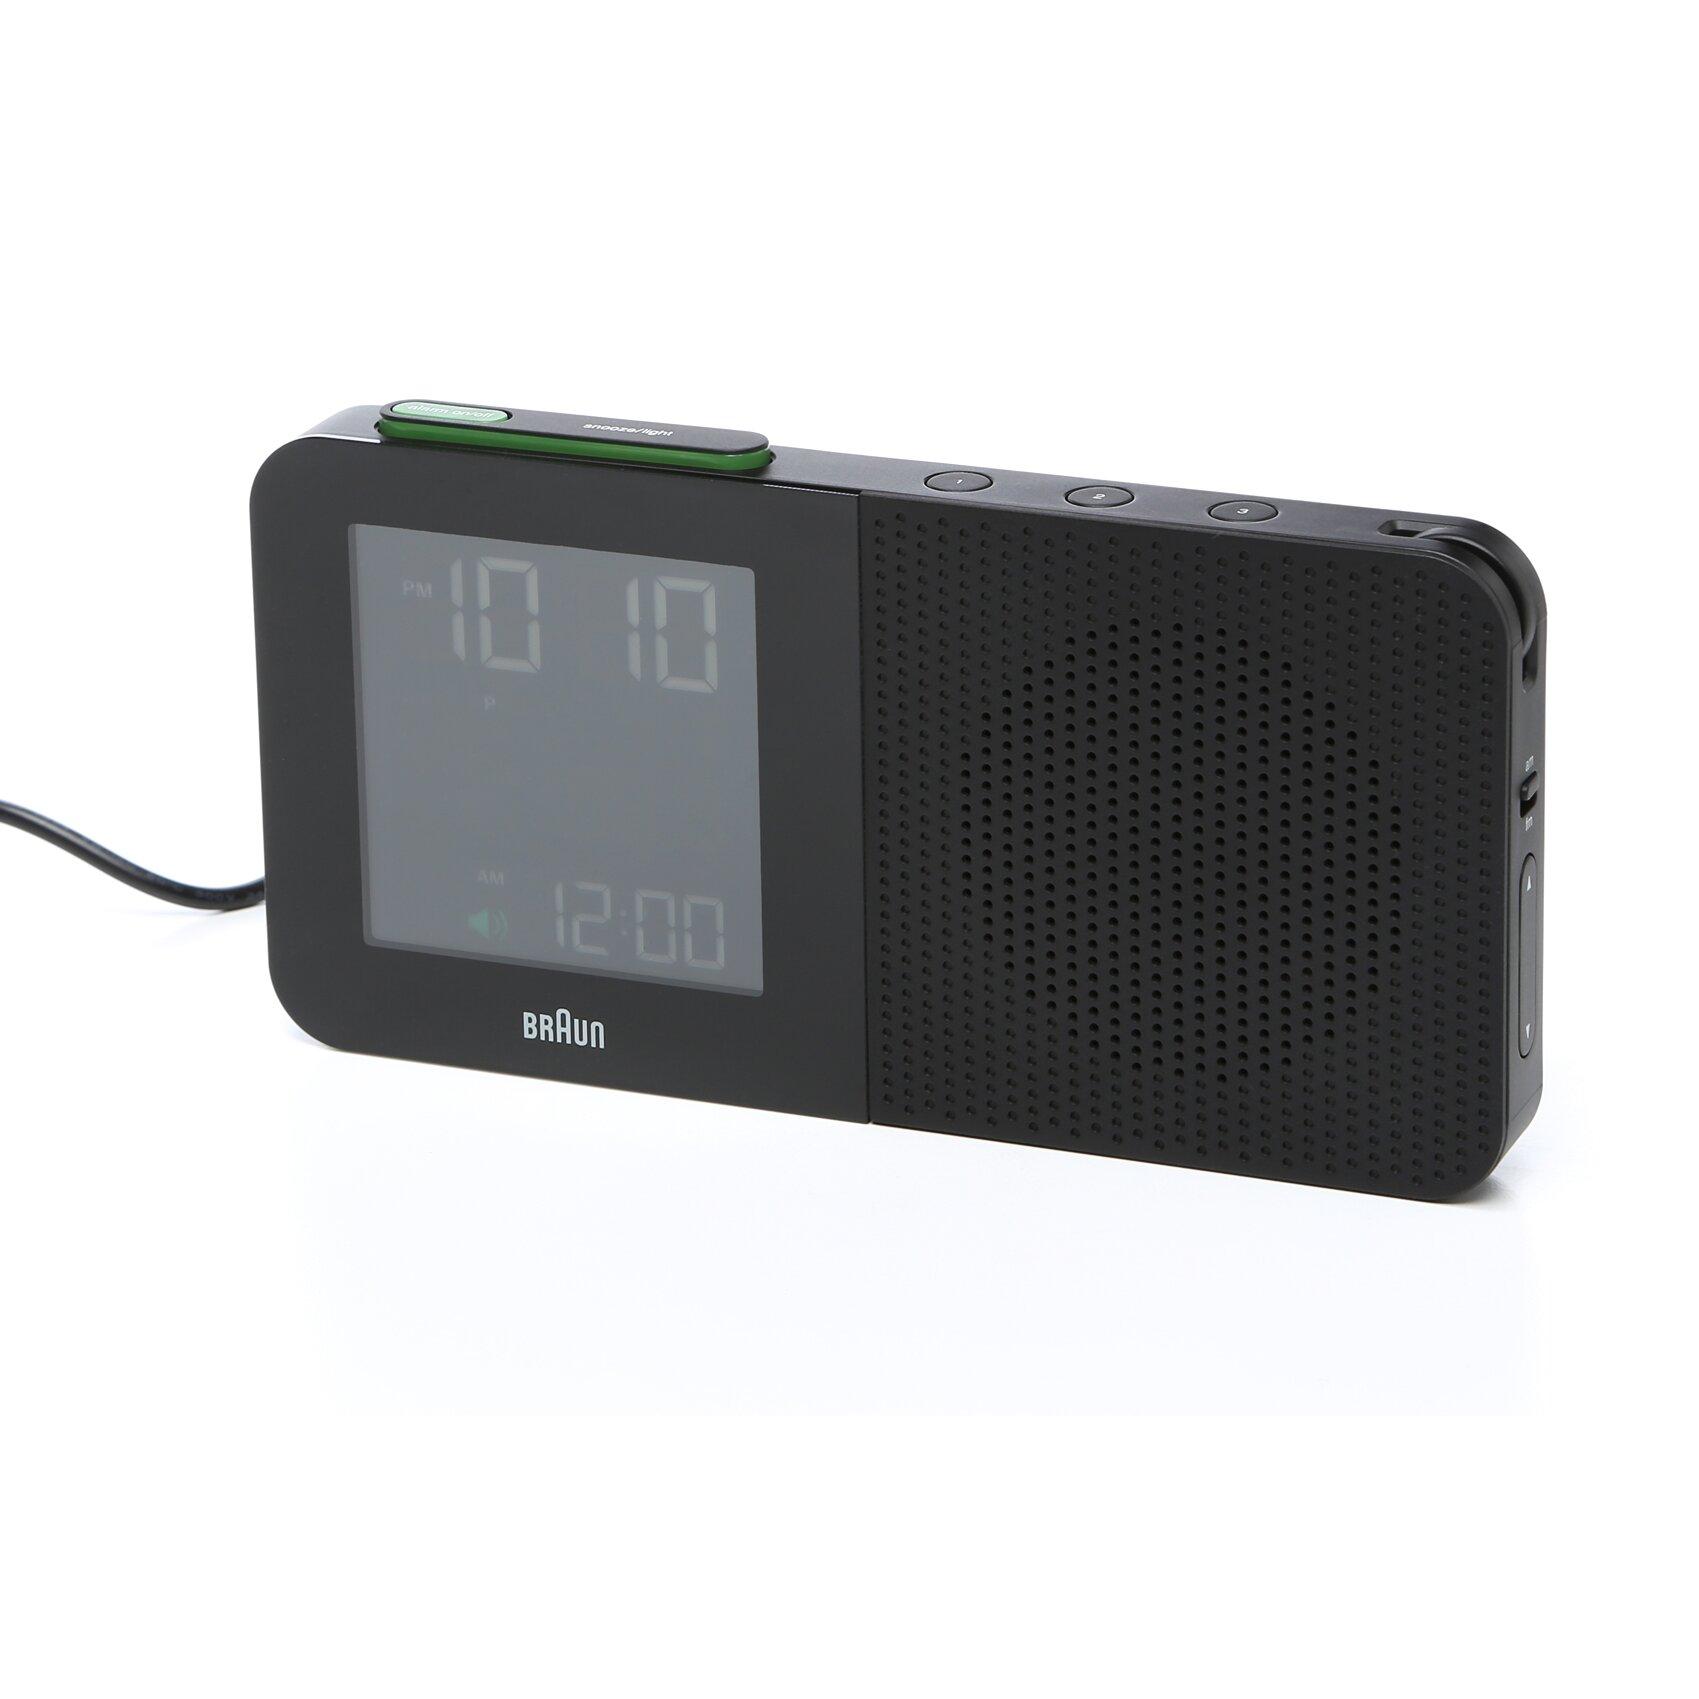 braun digital alarm clock radio reviews wayfair. Black Bedroom Furniture Sets. Home Design Ideas